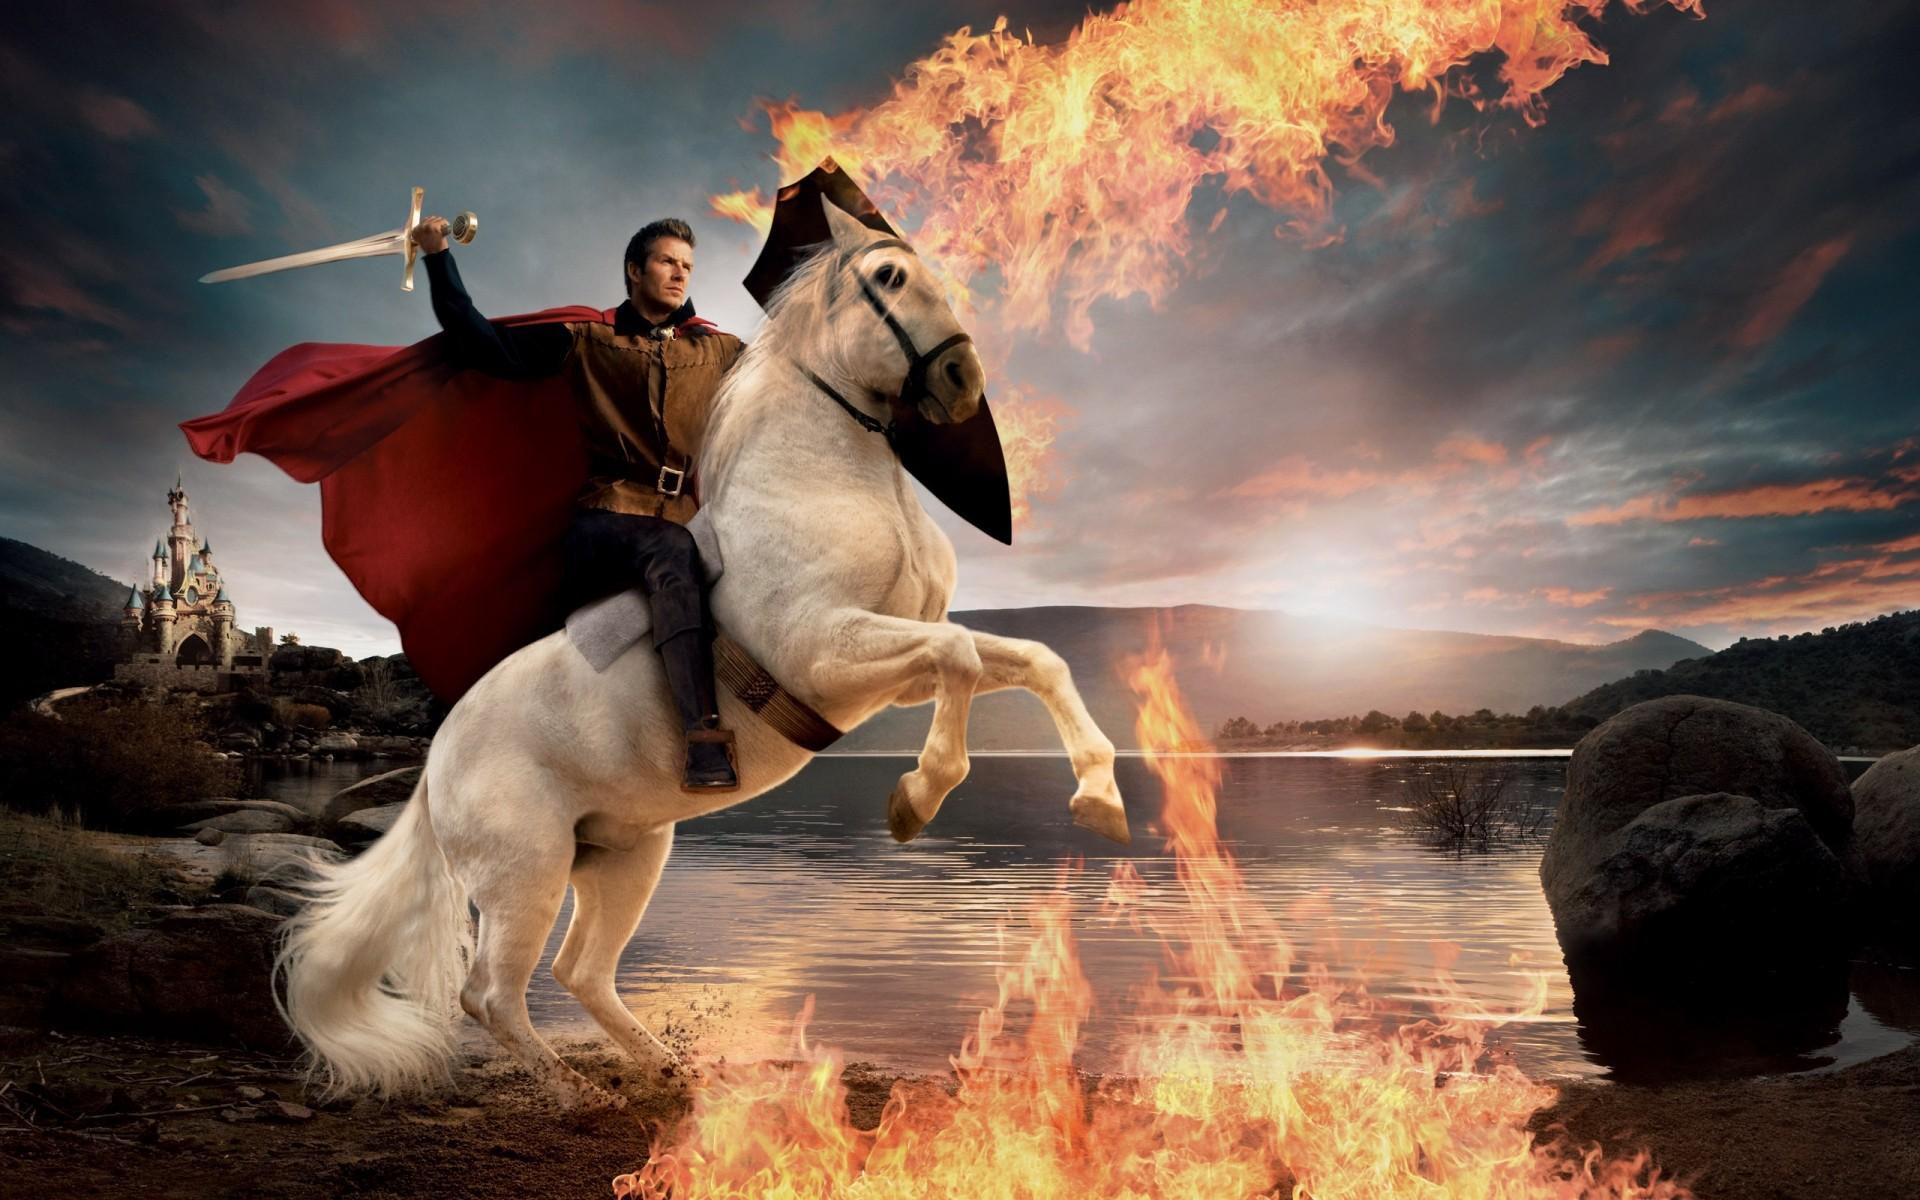 David Beckham Horse Riding Free Wallpapers